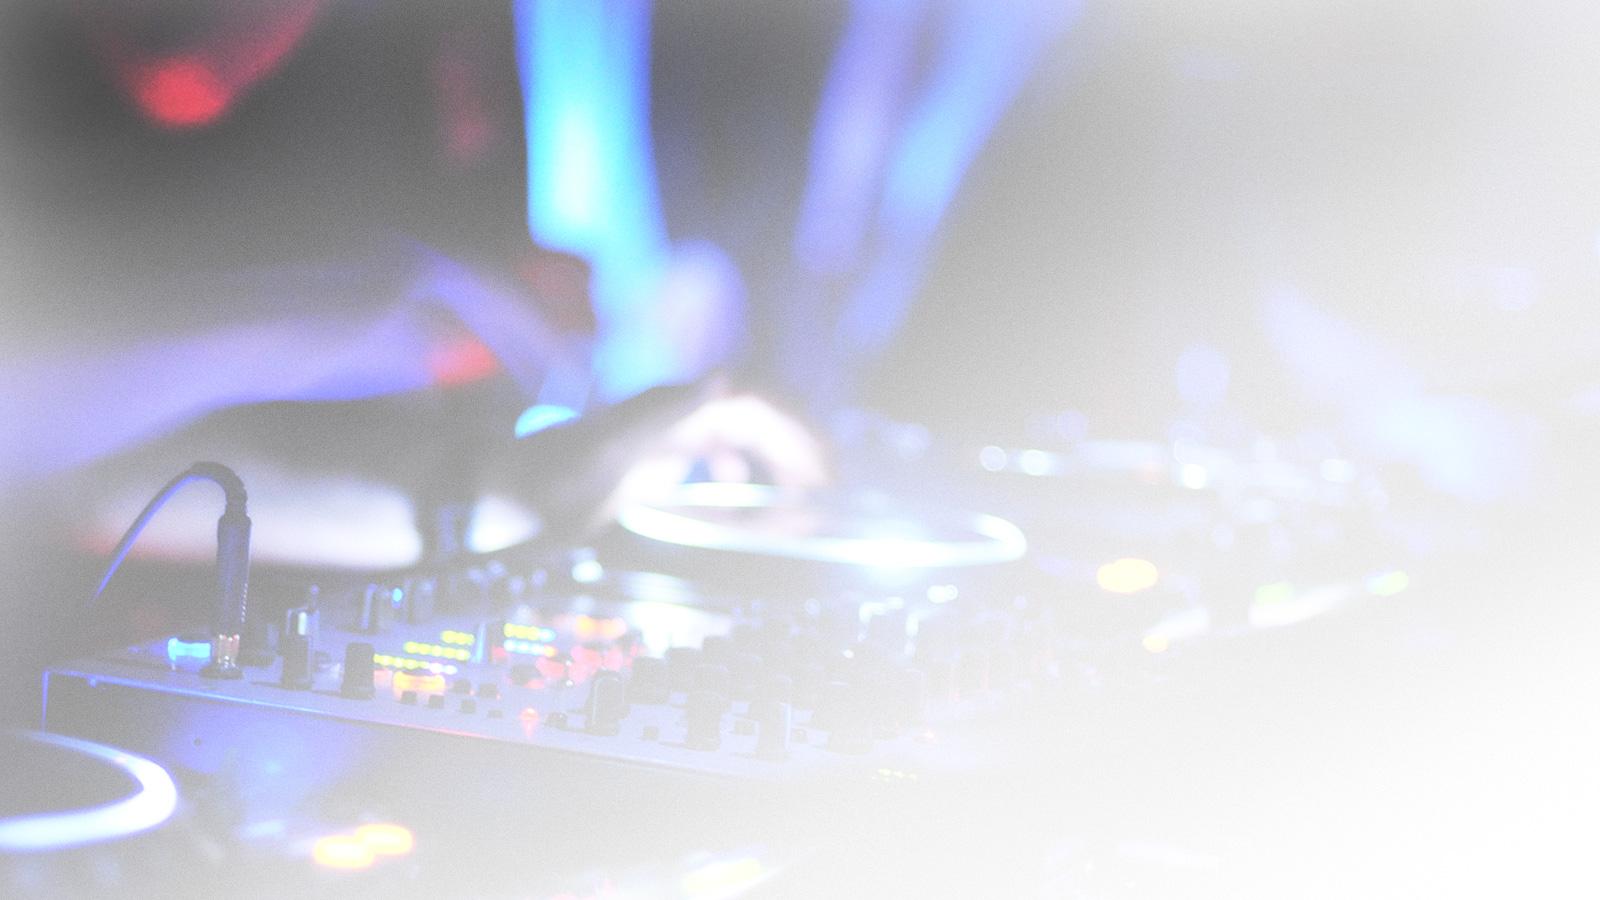 sound-active-events-djsetup-bg1